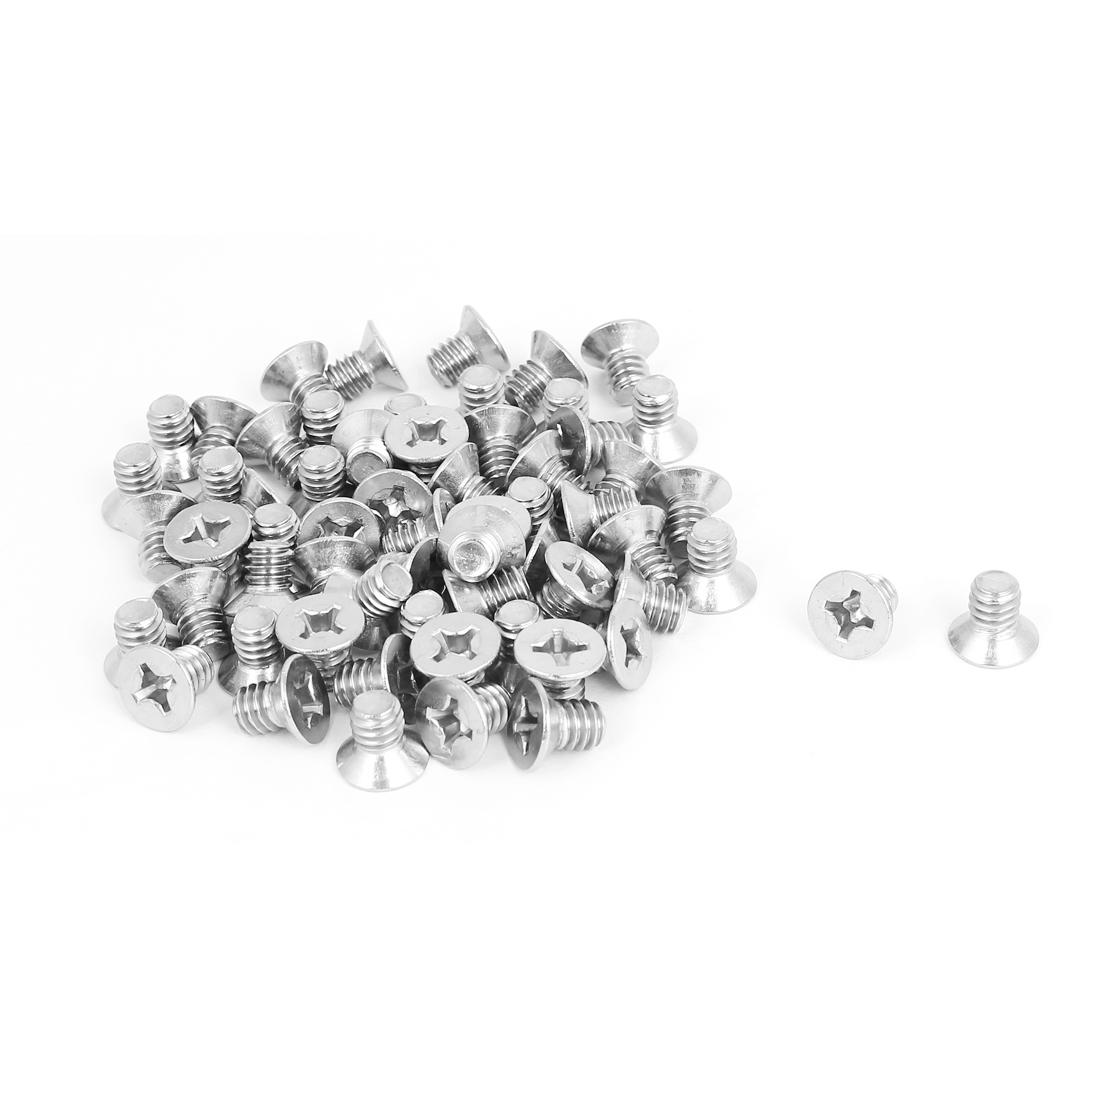 "1/4""-20x3/8"" Stainless Steel Phillips Flat Countersunk Head Screws 50pcs"